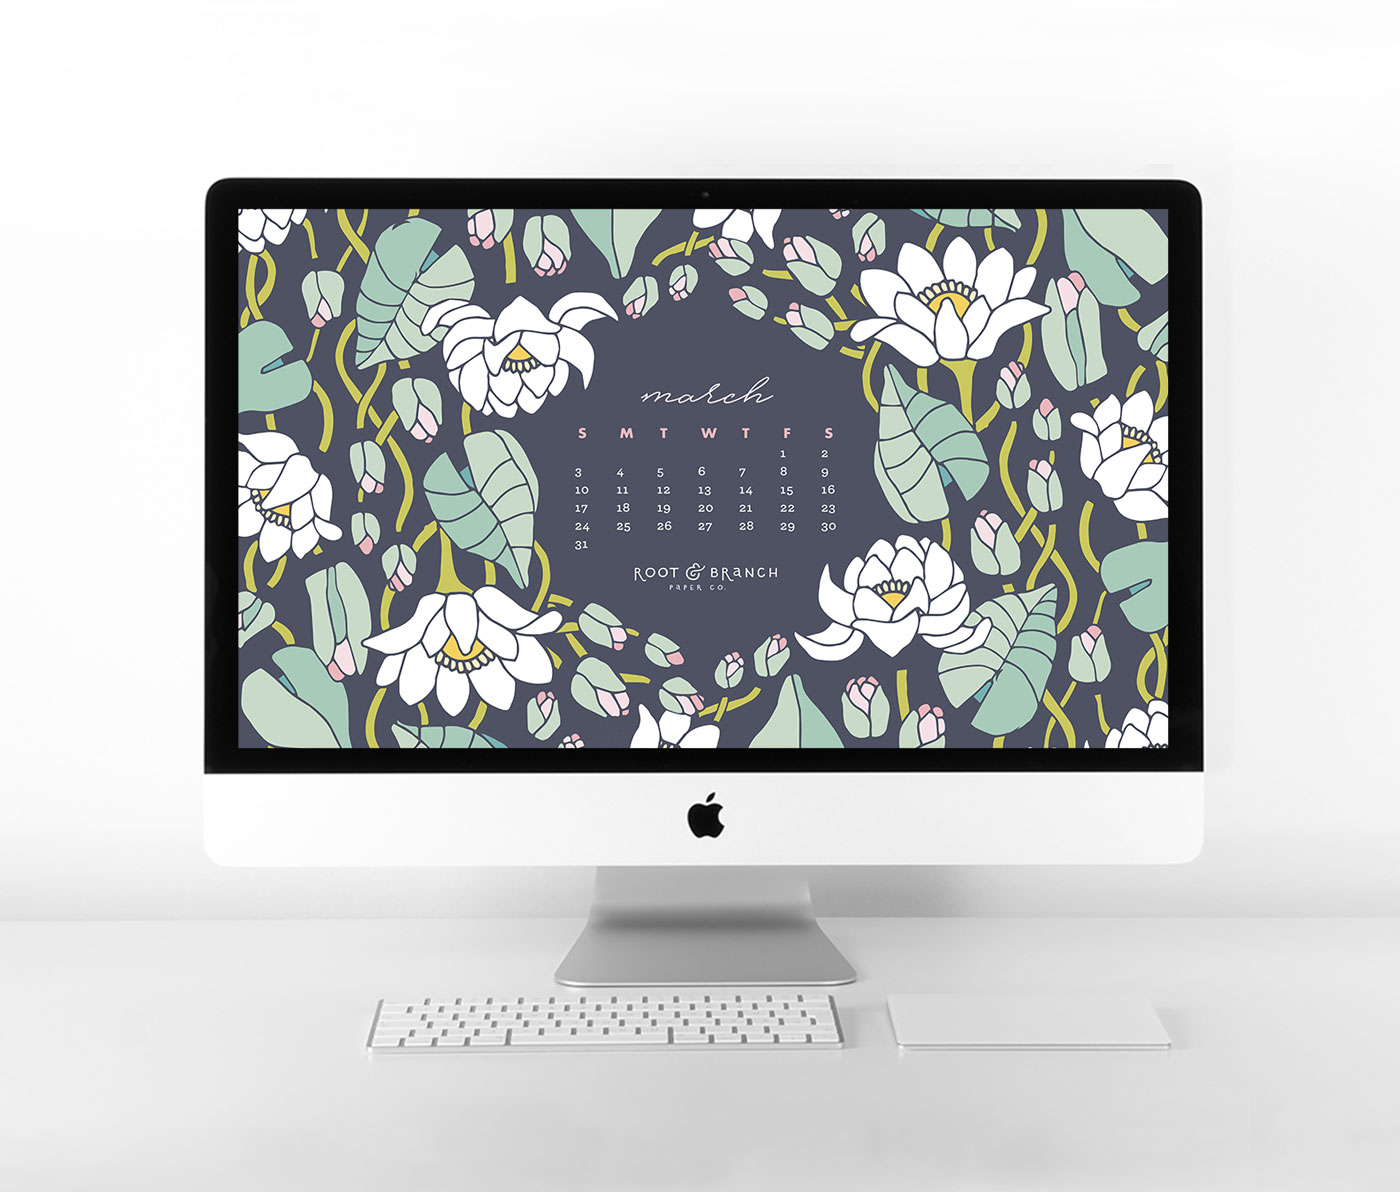 March 2019 Calendar Wallpaper, Free Digital Desktop Wallpaper, Illustrated Floral Desktop Calendar by Root & Branch Paper Co.